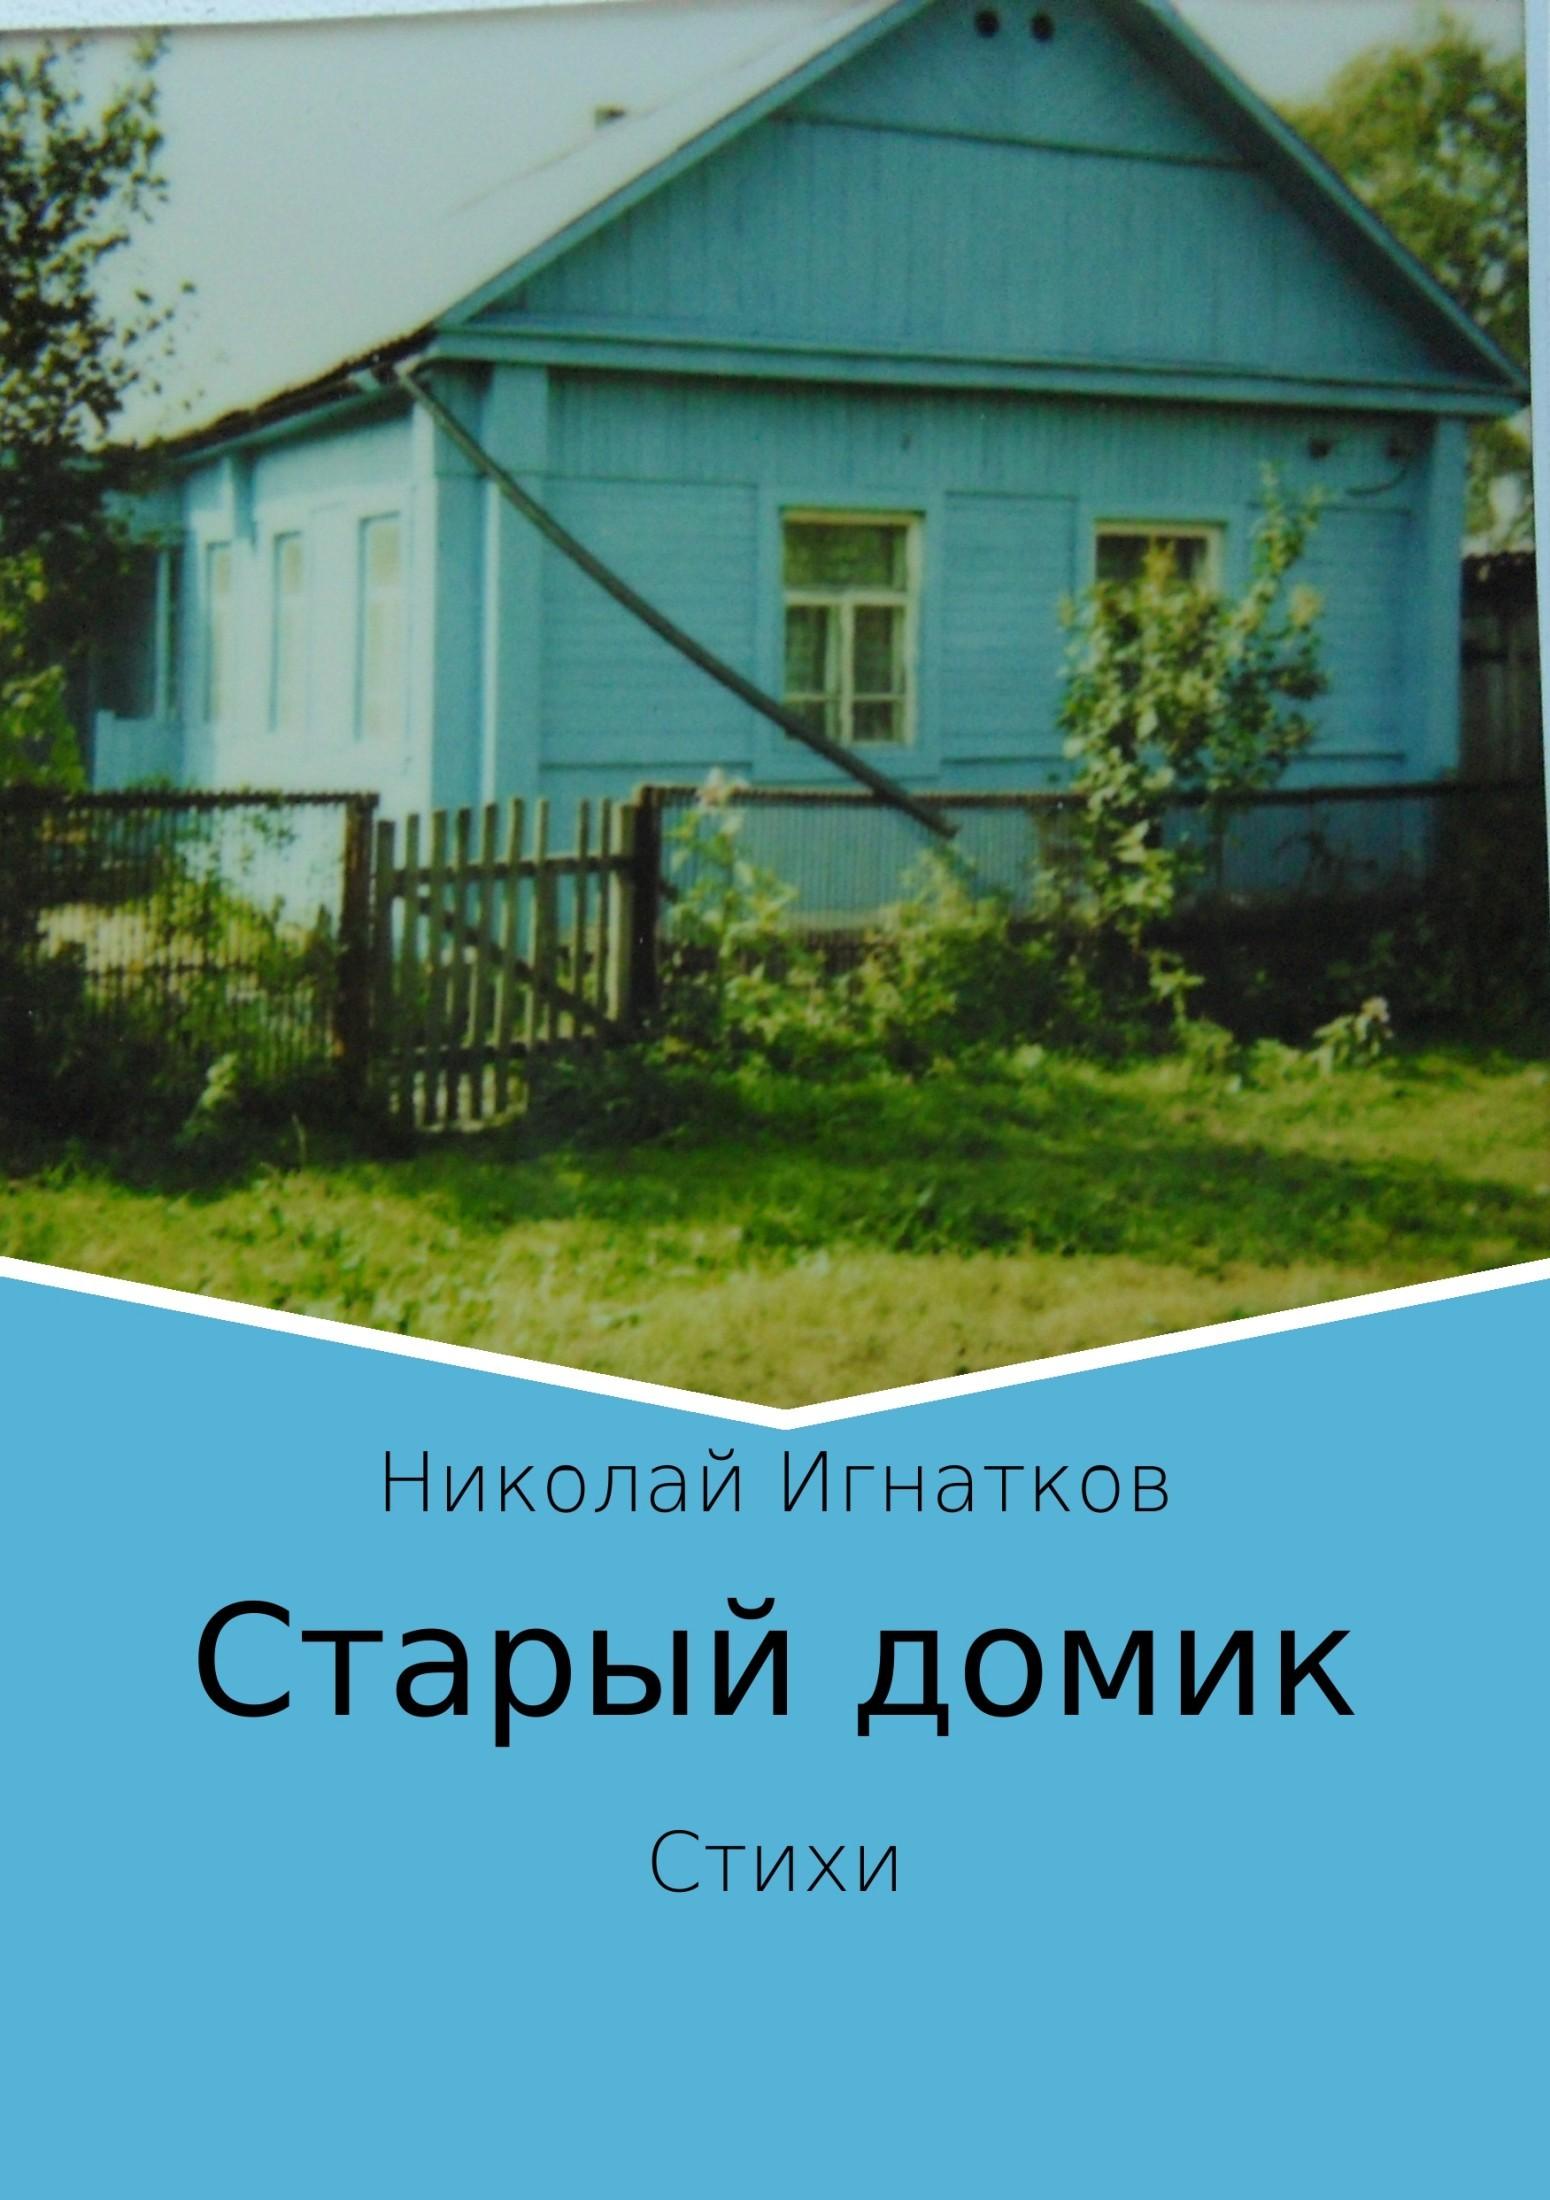 Книга Старый домик. Стихи